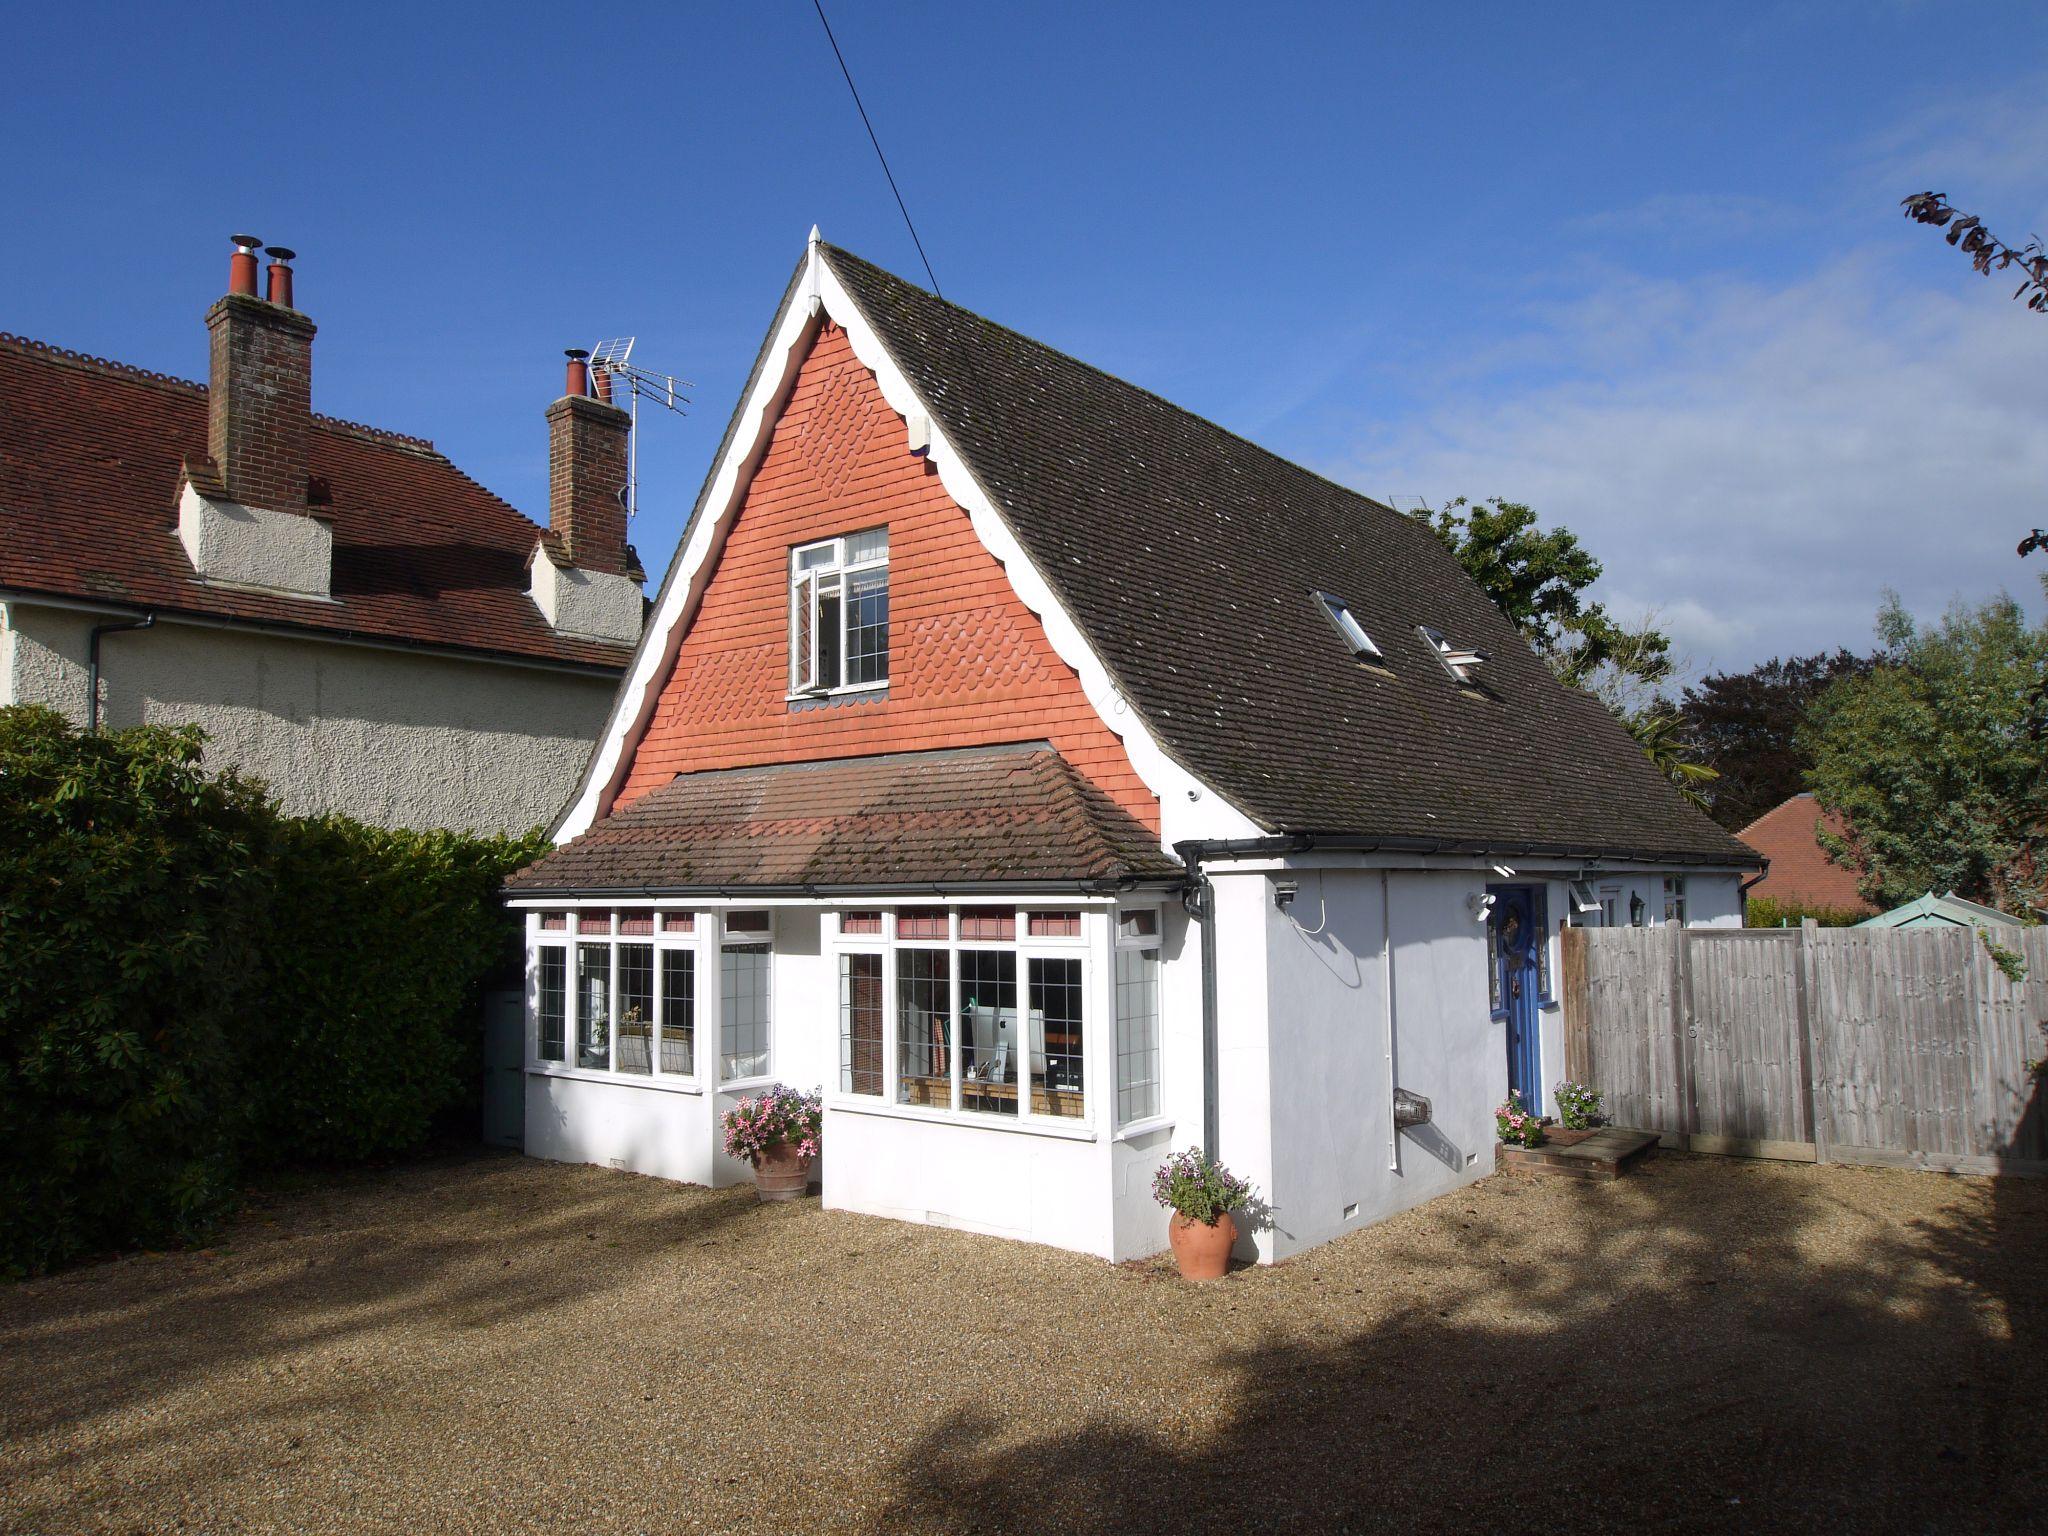 3 bedroom detached house Sold in Sevenoaks - Photograph 1